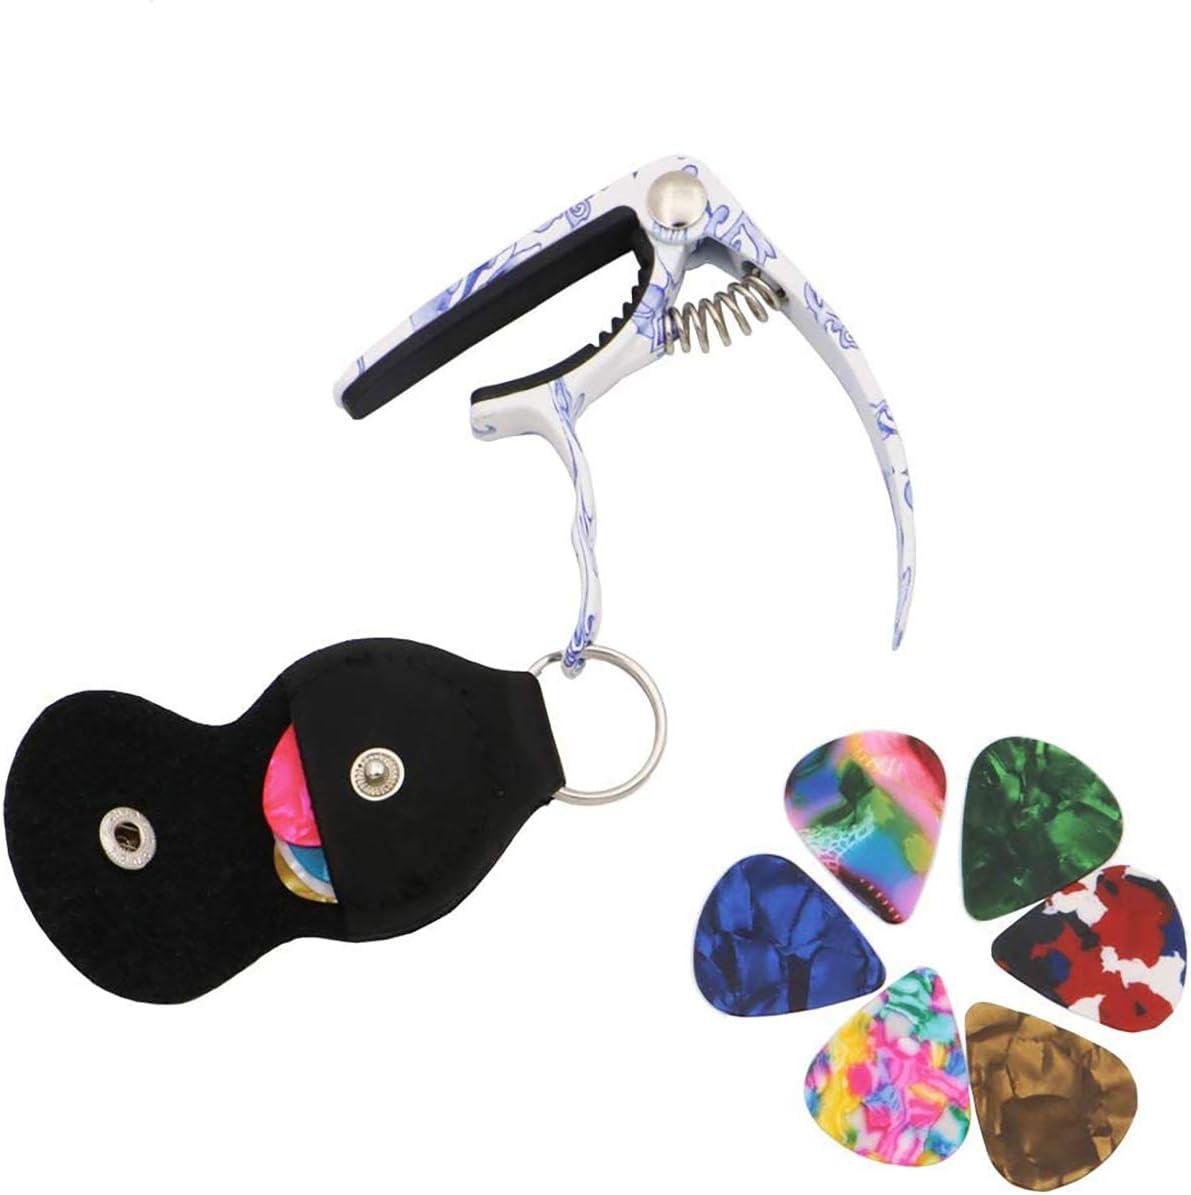 Blue and white porcelain Guitar Capo,Leather pick bag,alloy guitar Diacritical clip for acoustic guitar ukulele electric guitar acoustic guitar picks